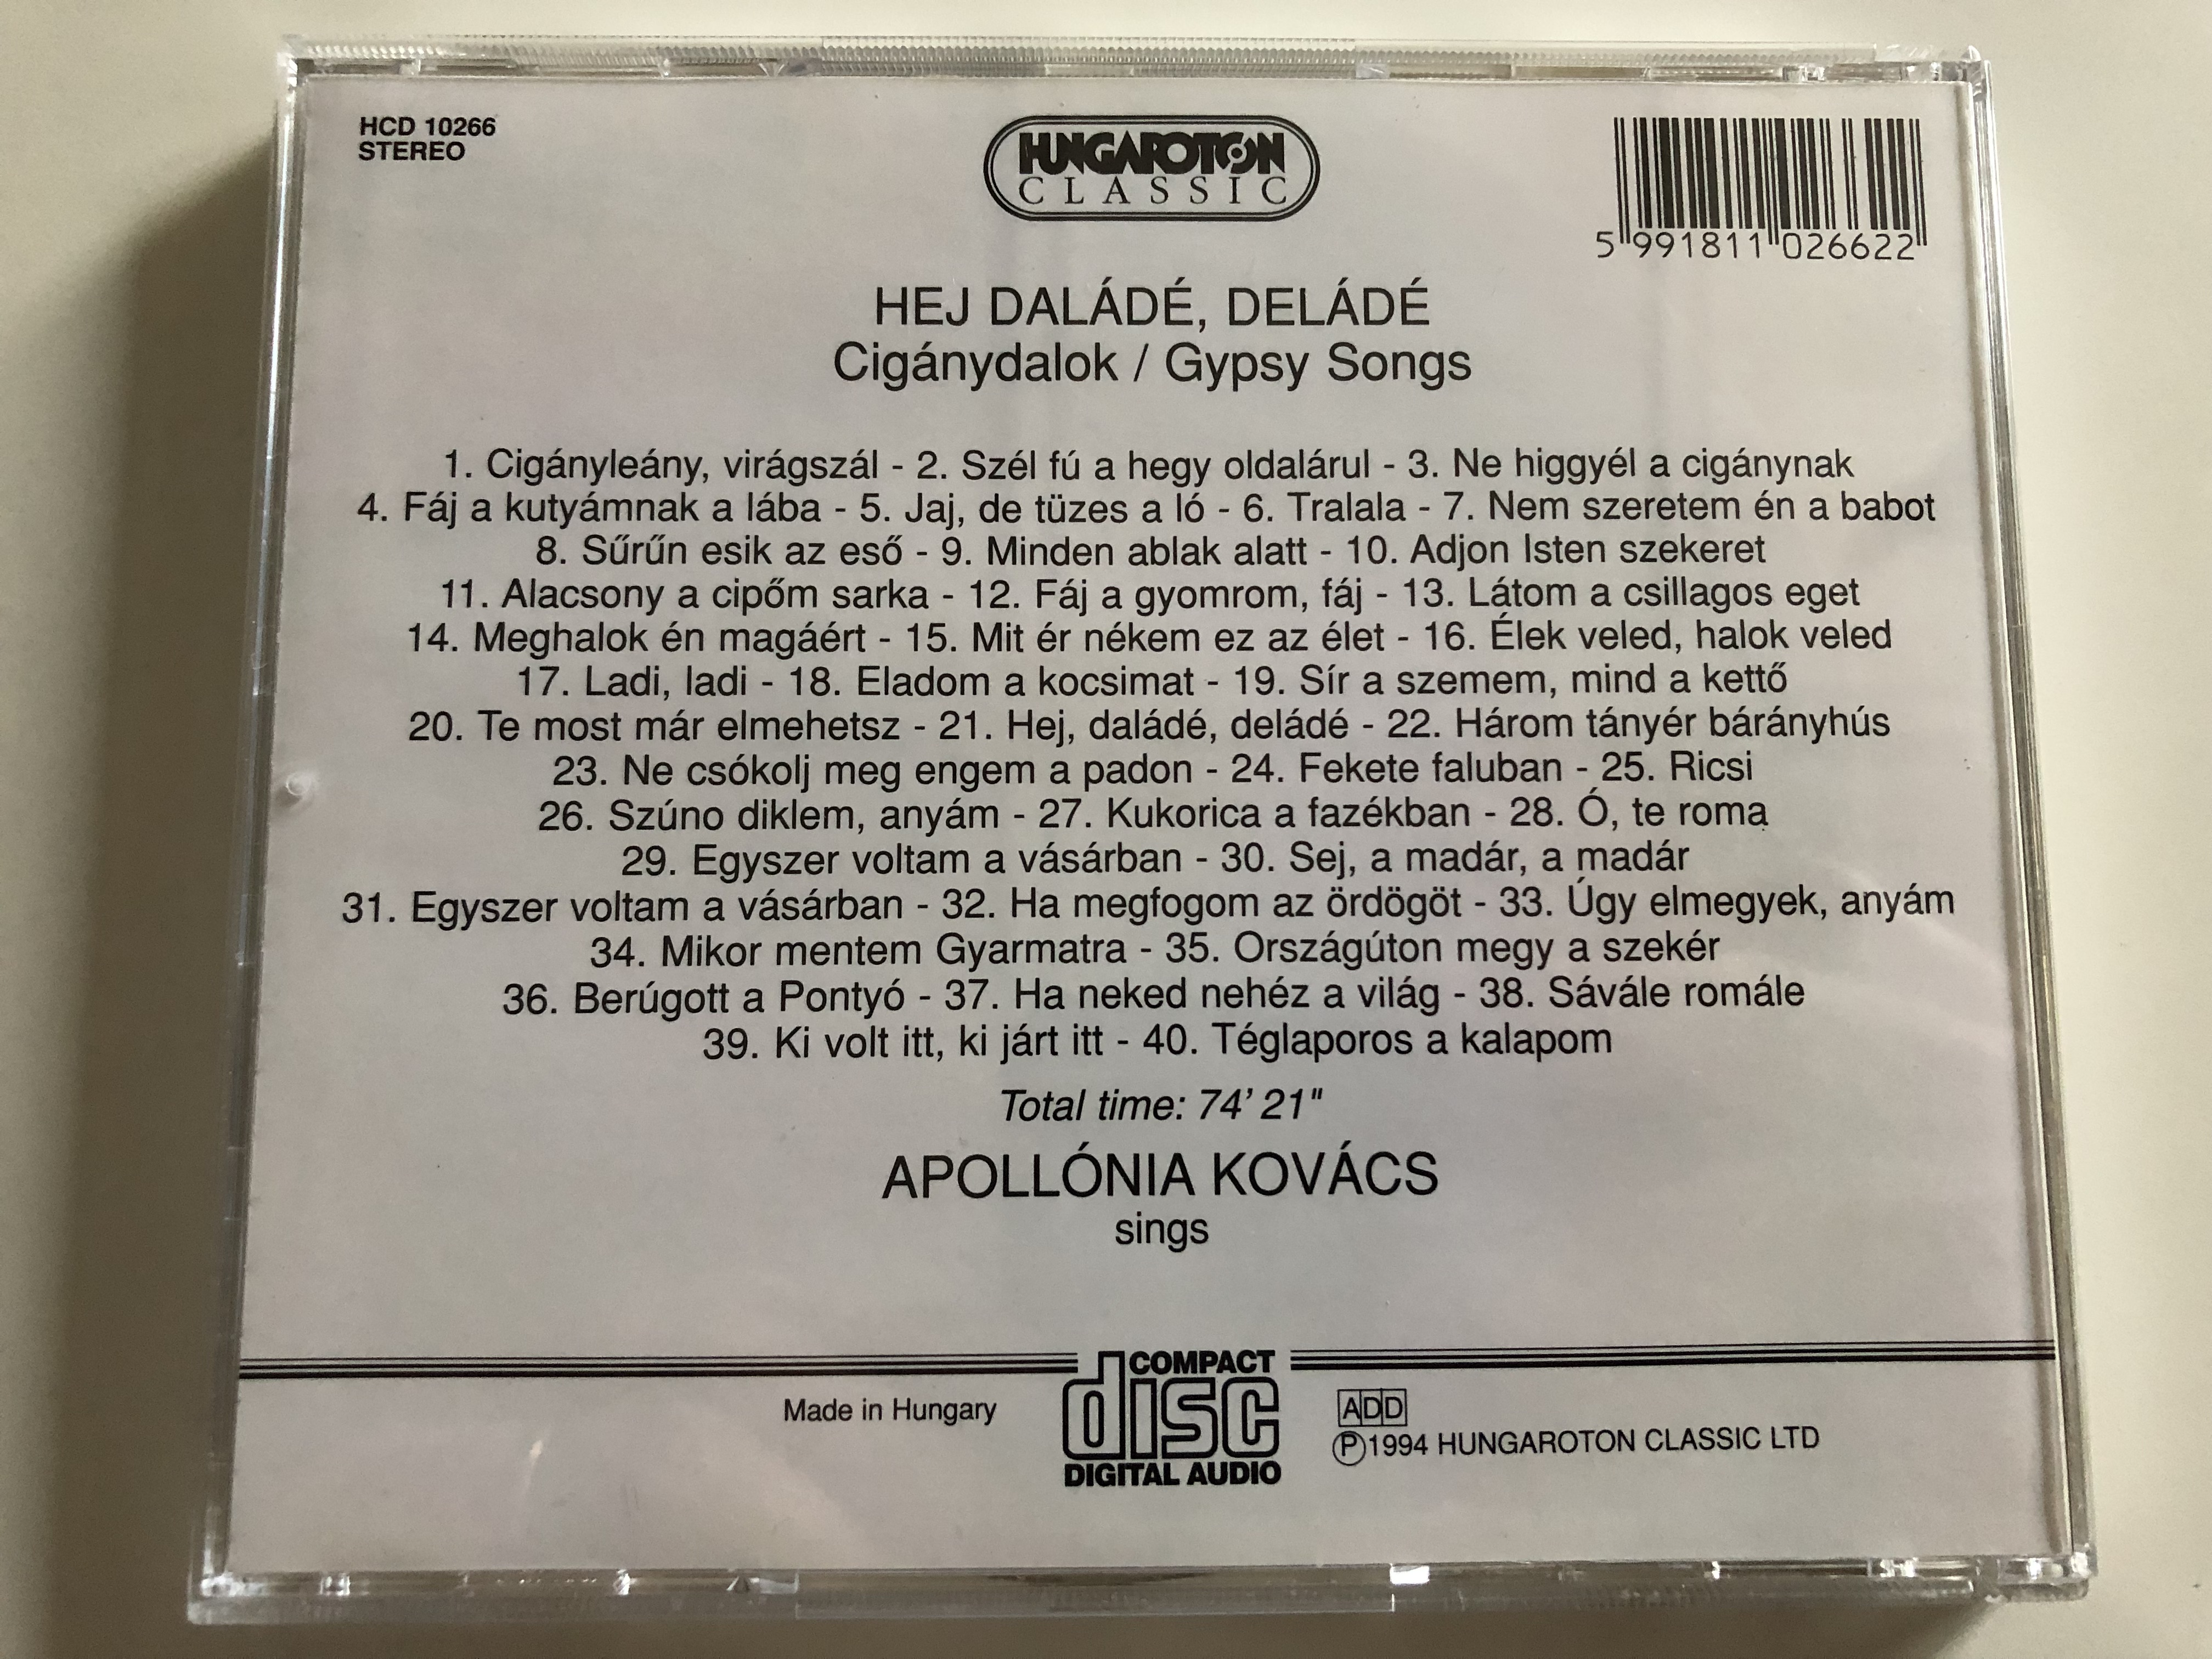 apoll-nia-kov-cs-hej-dal-d-del-d-gypsy-songs-cig-nydalok-hungaroton-classic-audio-cd-1994-hcd-10266-6-.jpg